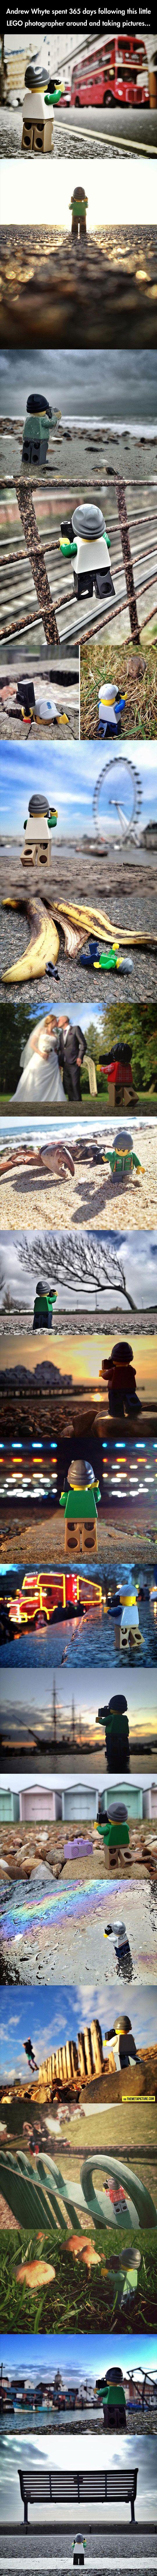 LEGO Photographer Travels The World